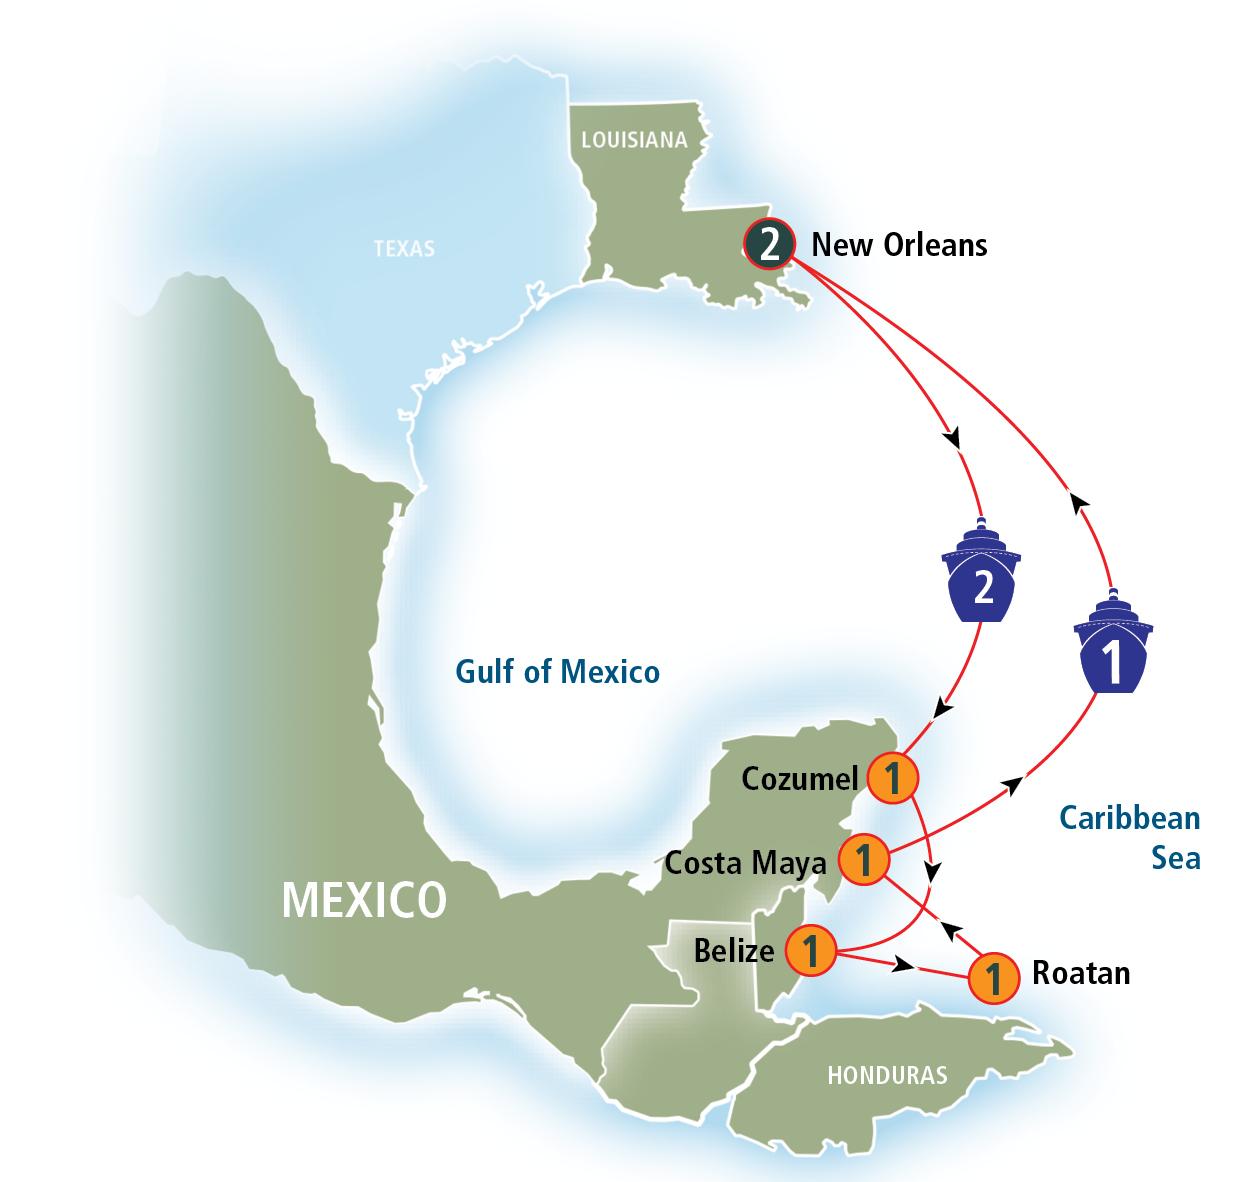 Norwegian Cruise Lines Day Western Caribbean Cruise Dawn With - West caribbean cruise